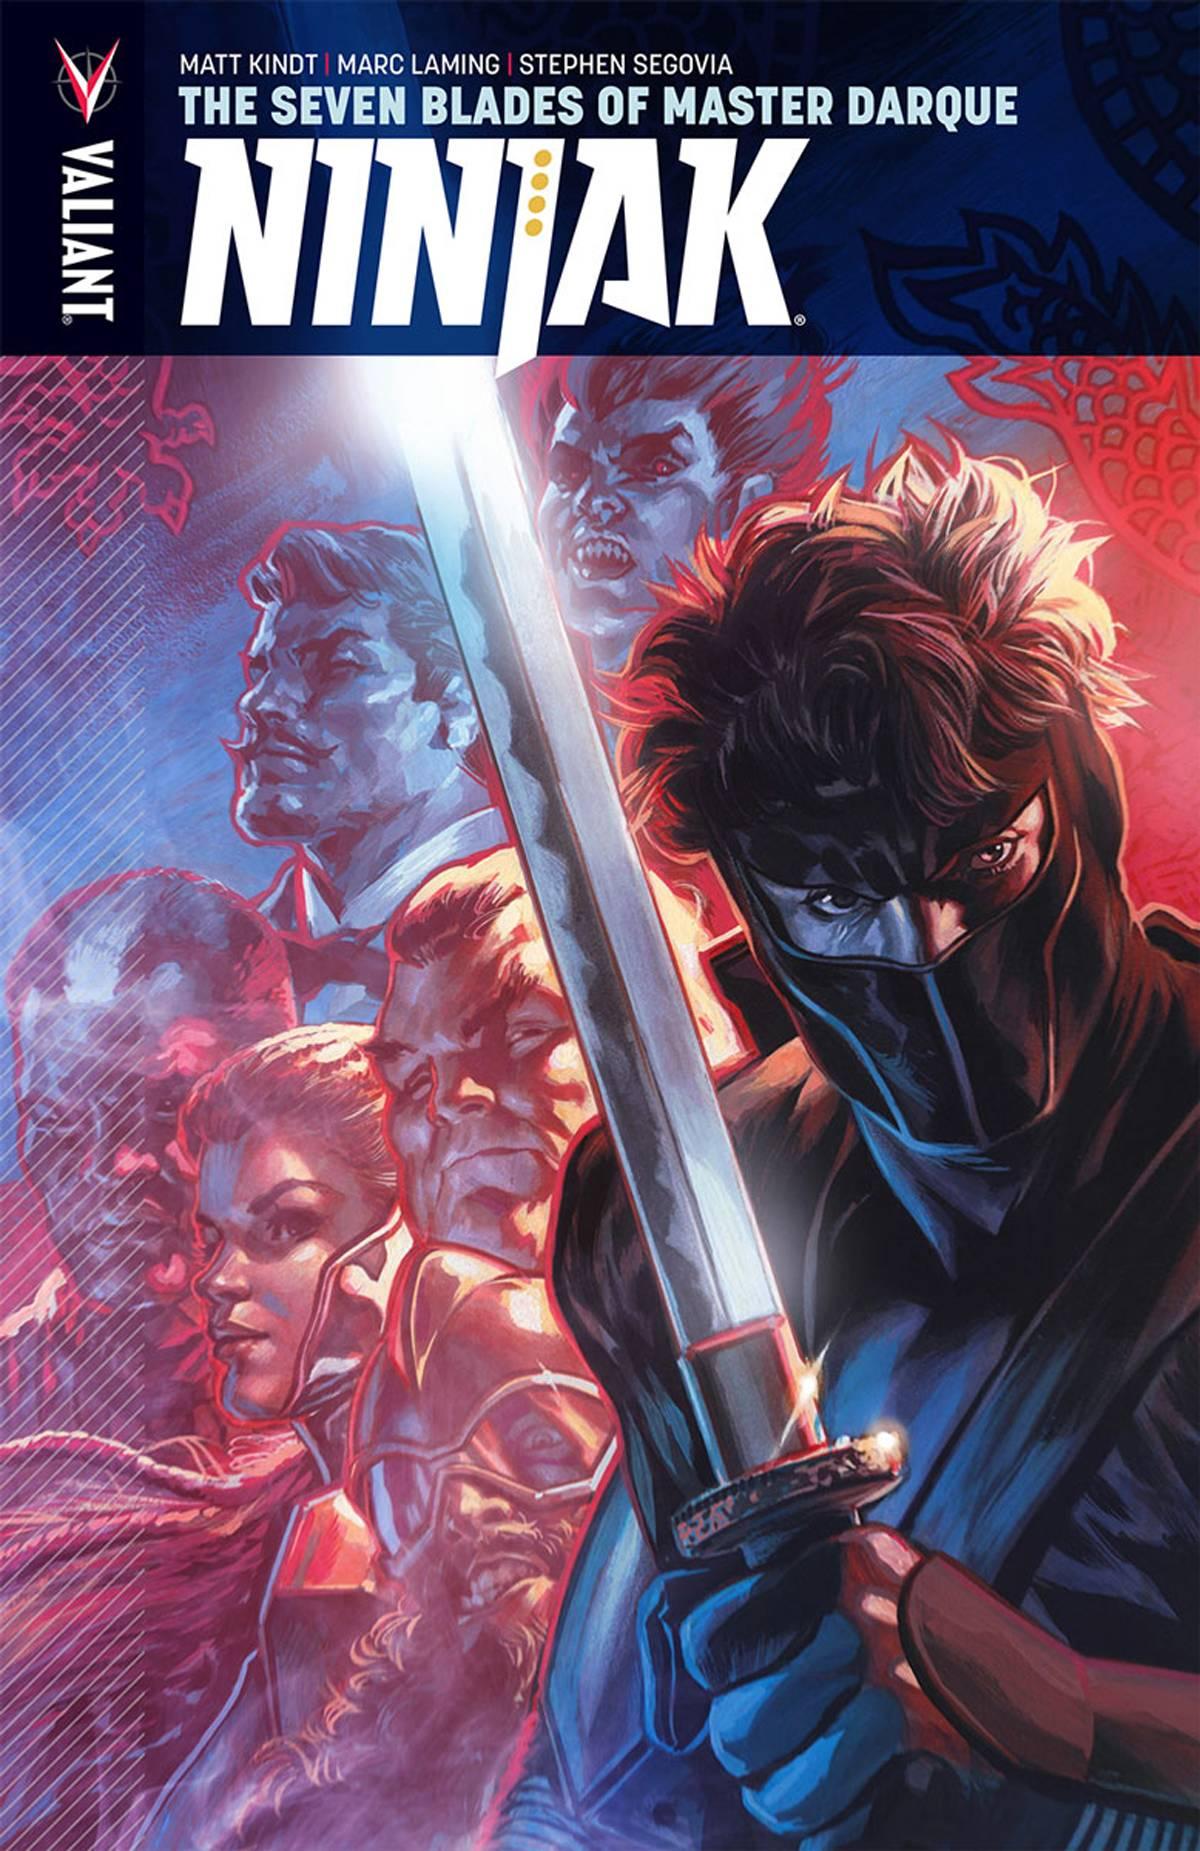 Ninjak Vol 6 The Seven Blades Of Master Darque TPB